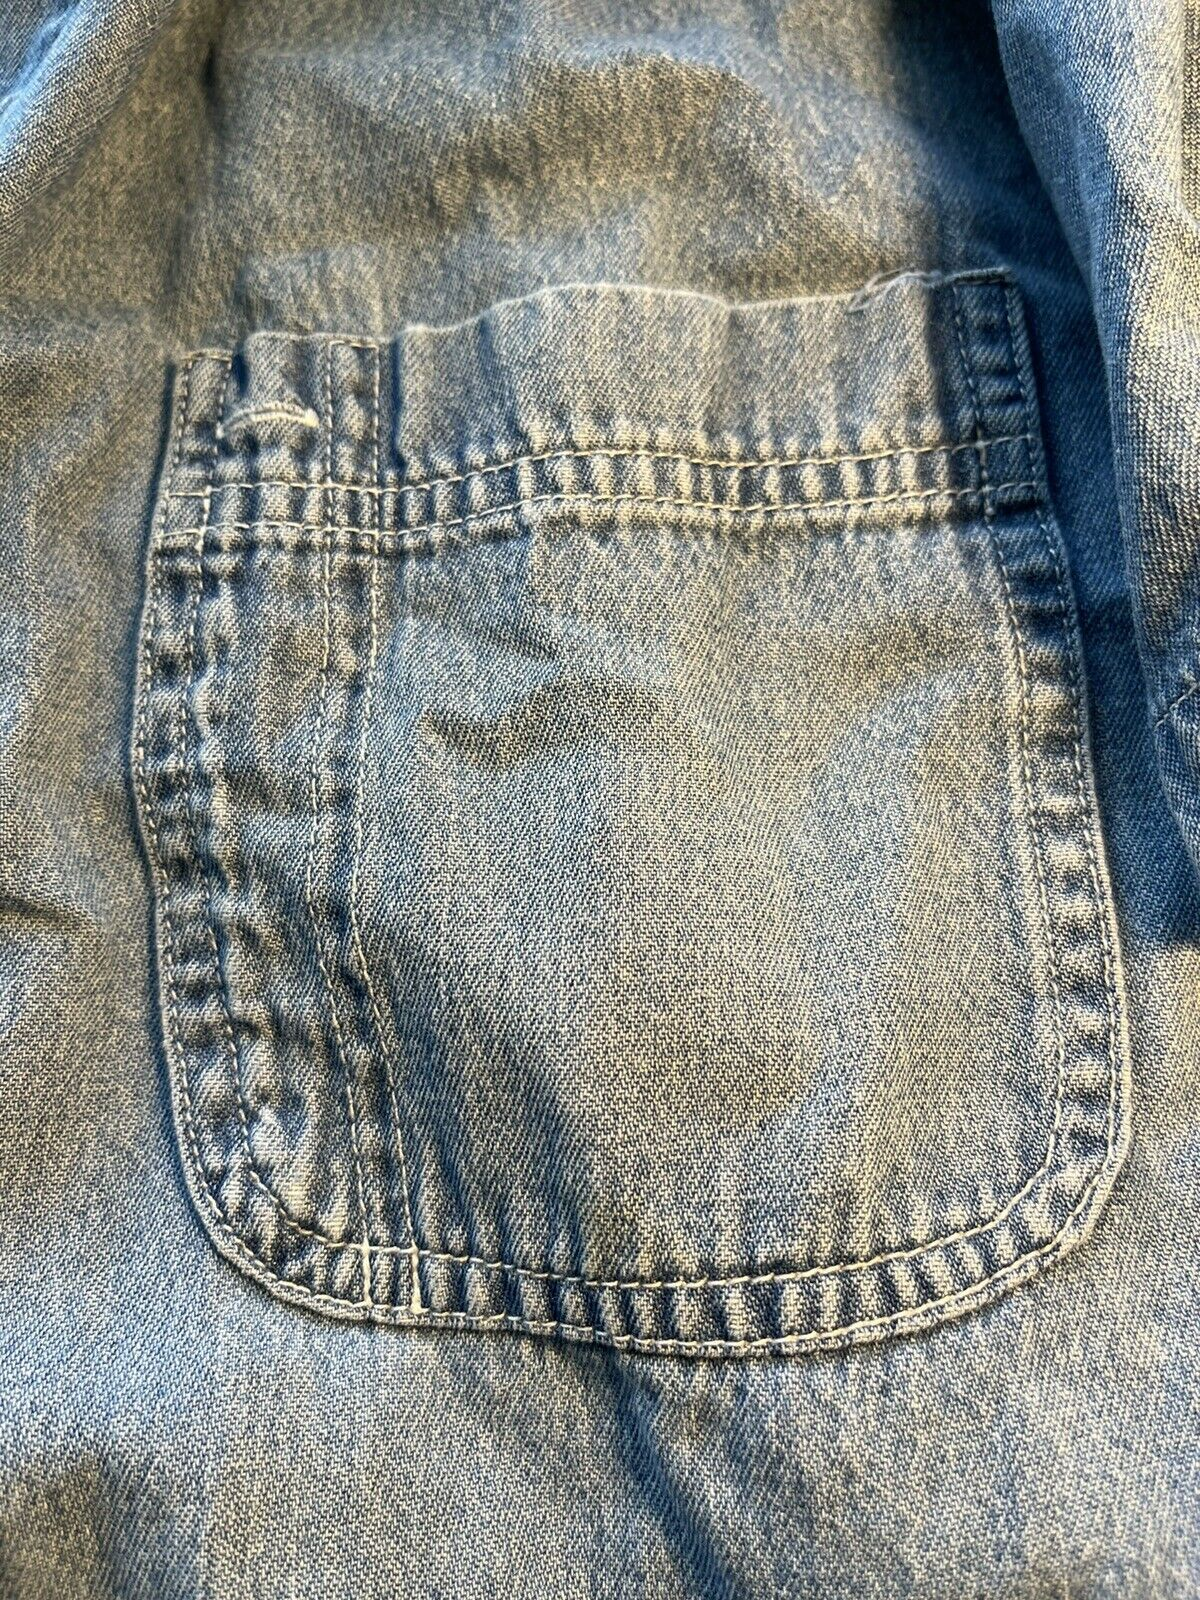 capristrano jeans jacket shirt - image 3